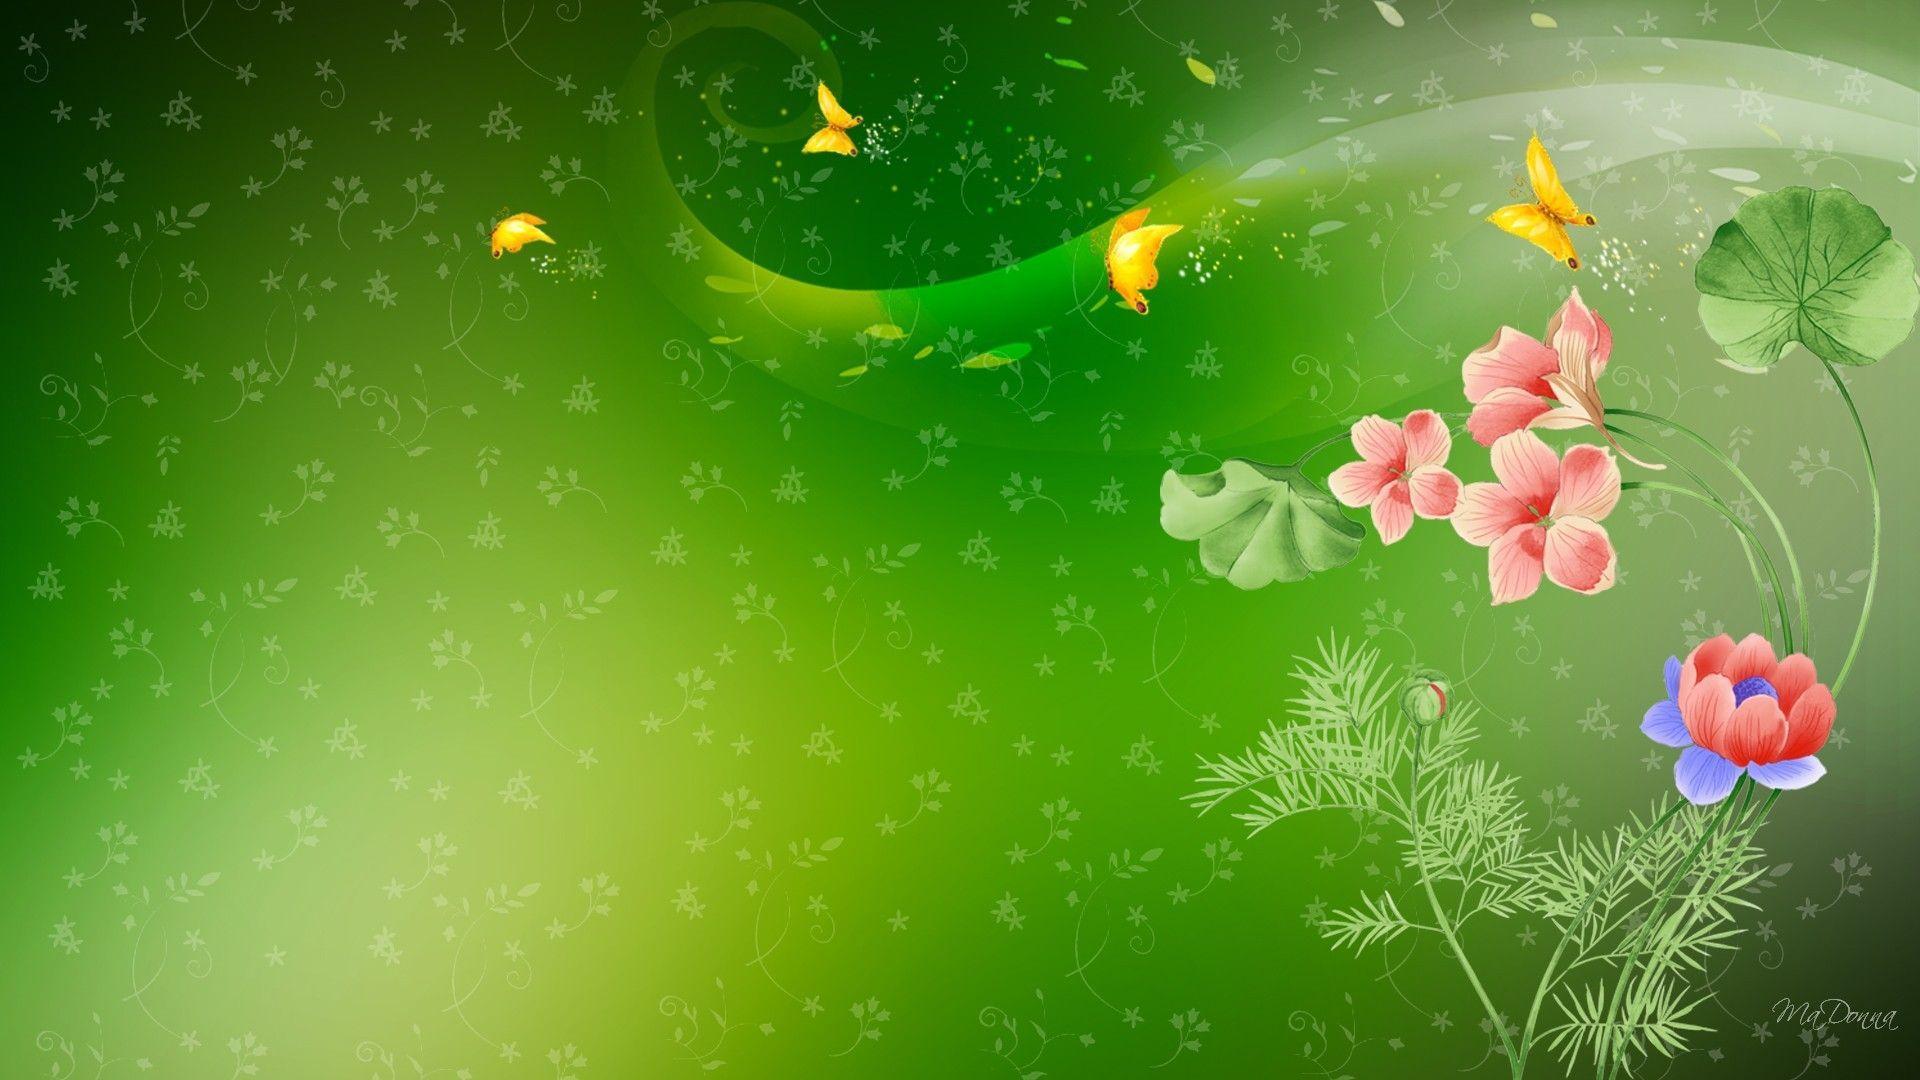 Обои на зеленом фоне цветы